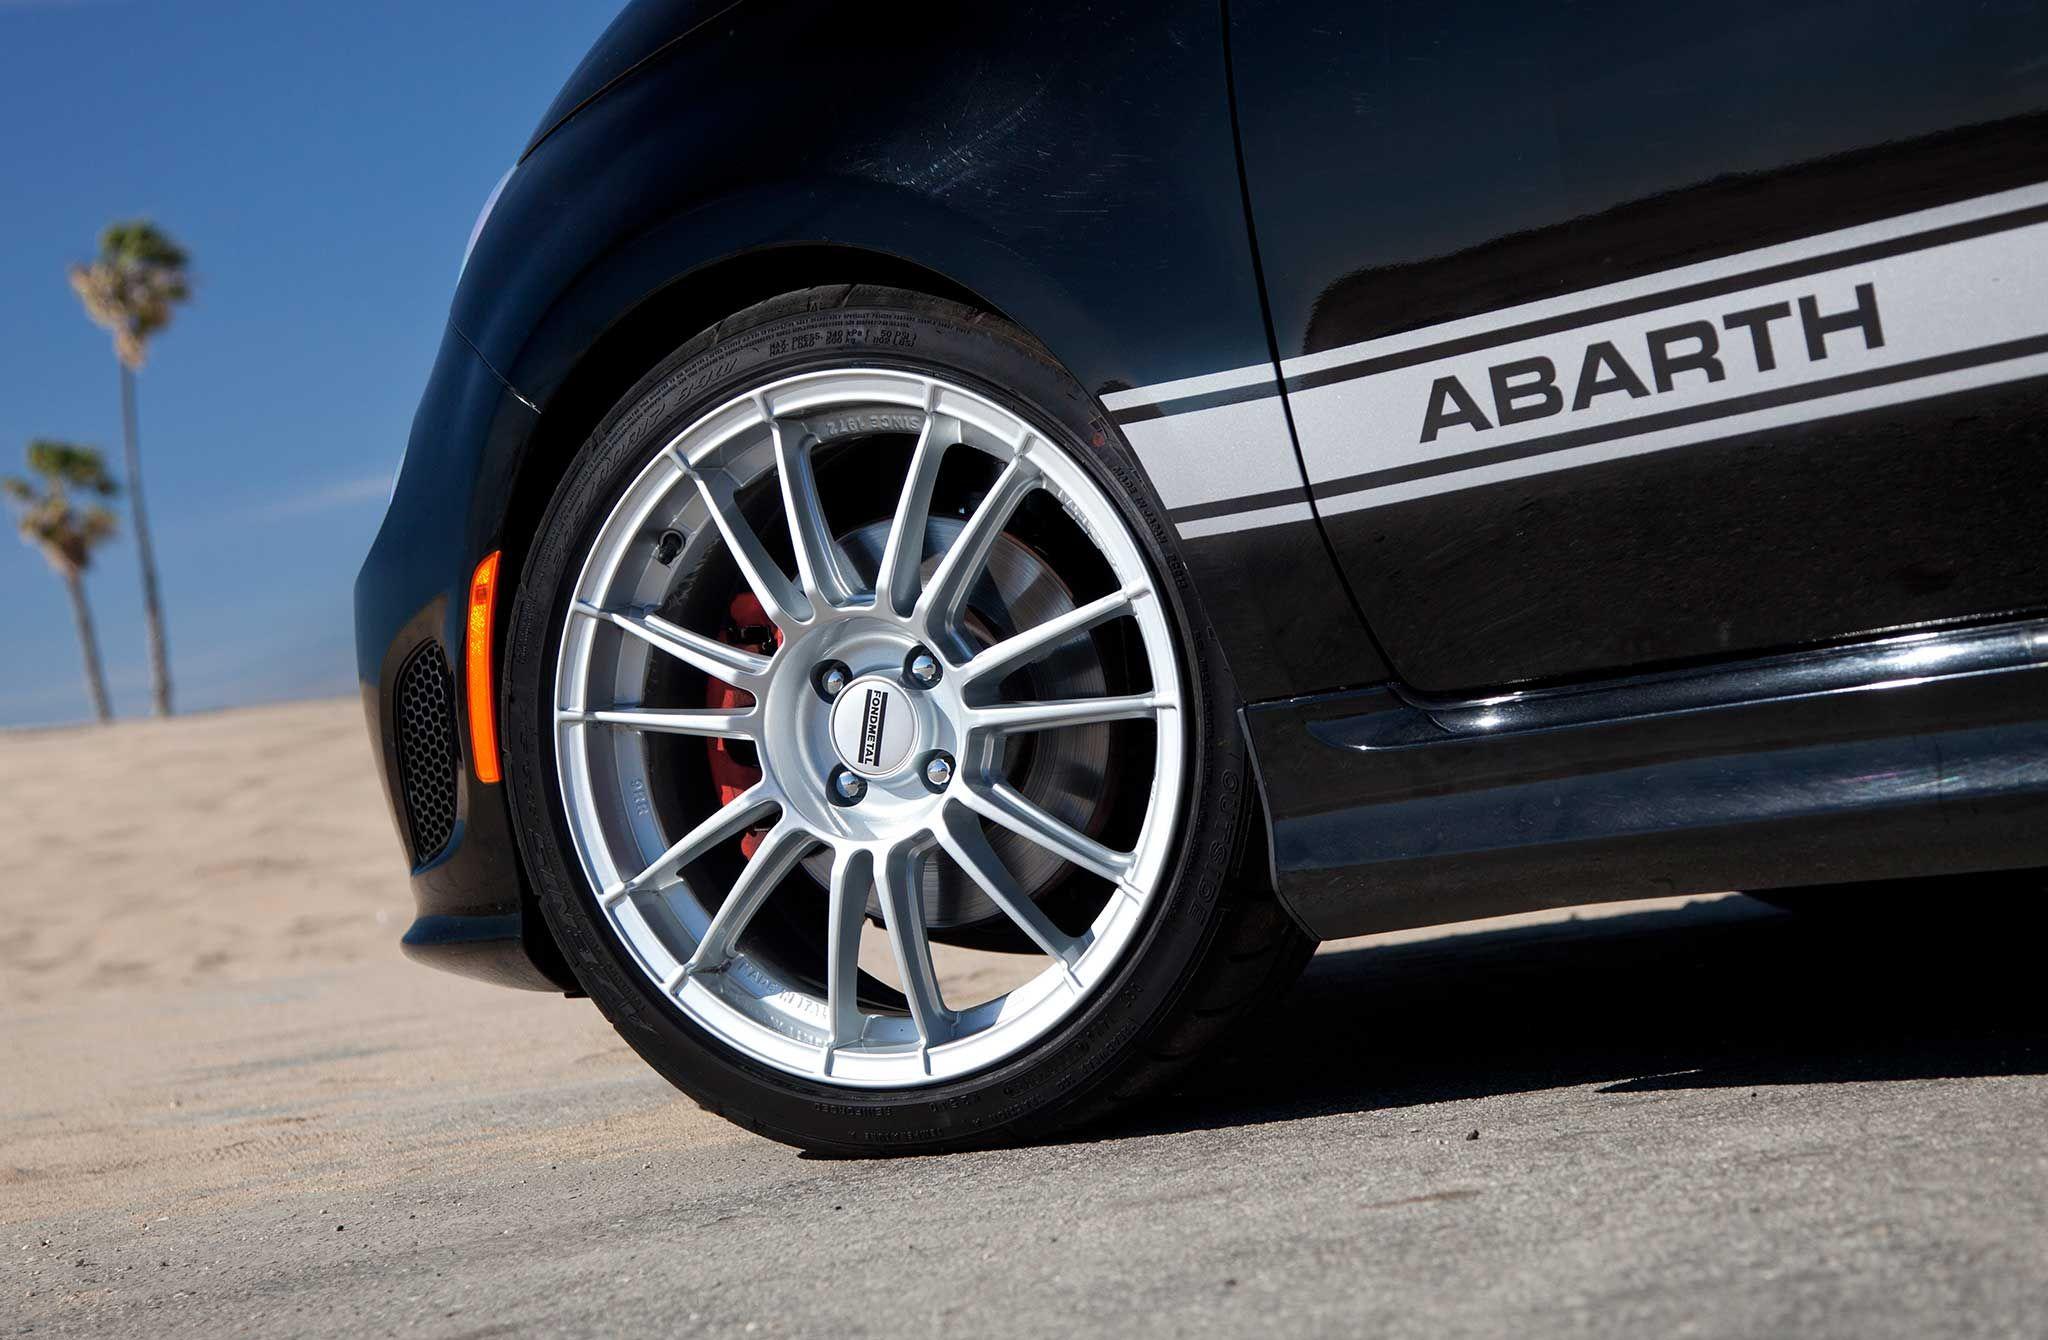 Fiat Abarth Fondmetal 9rr Wheels